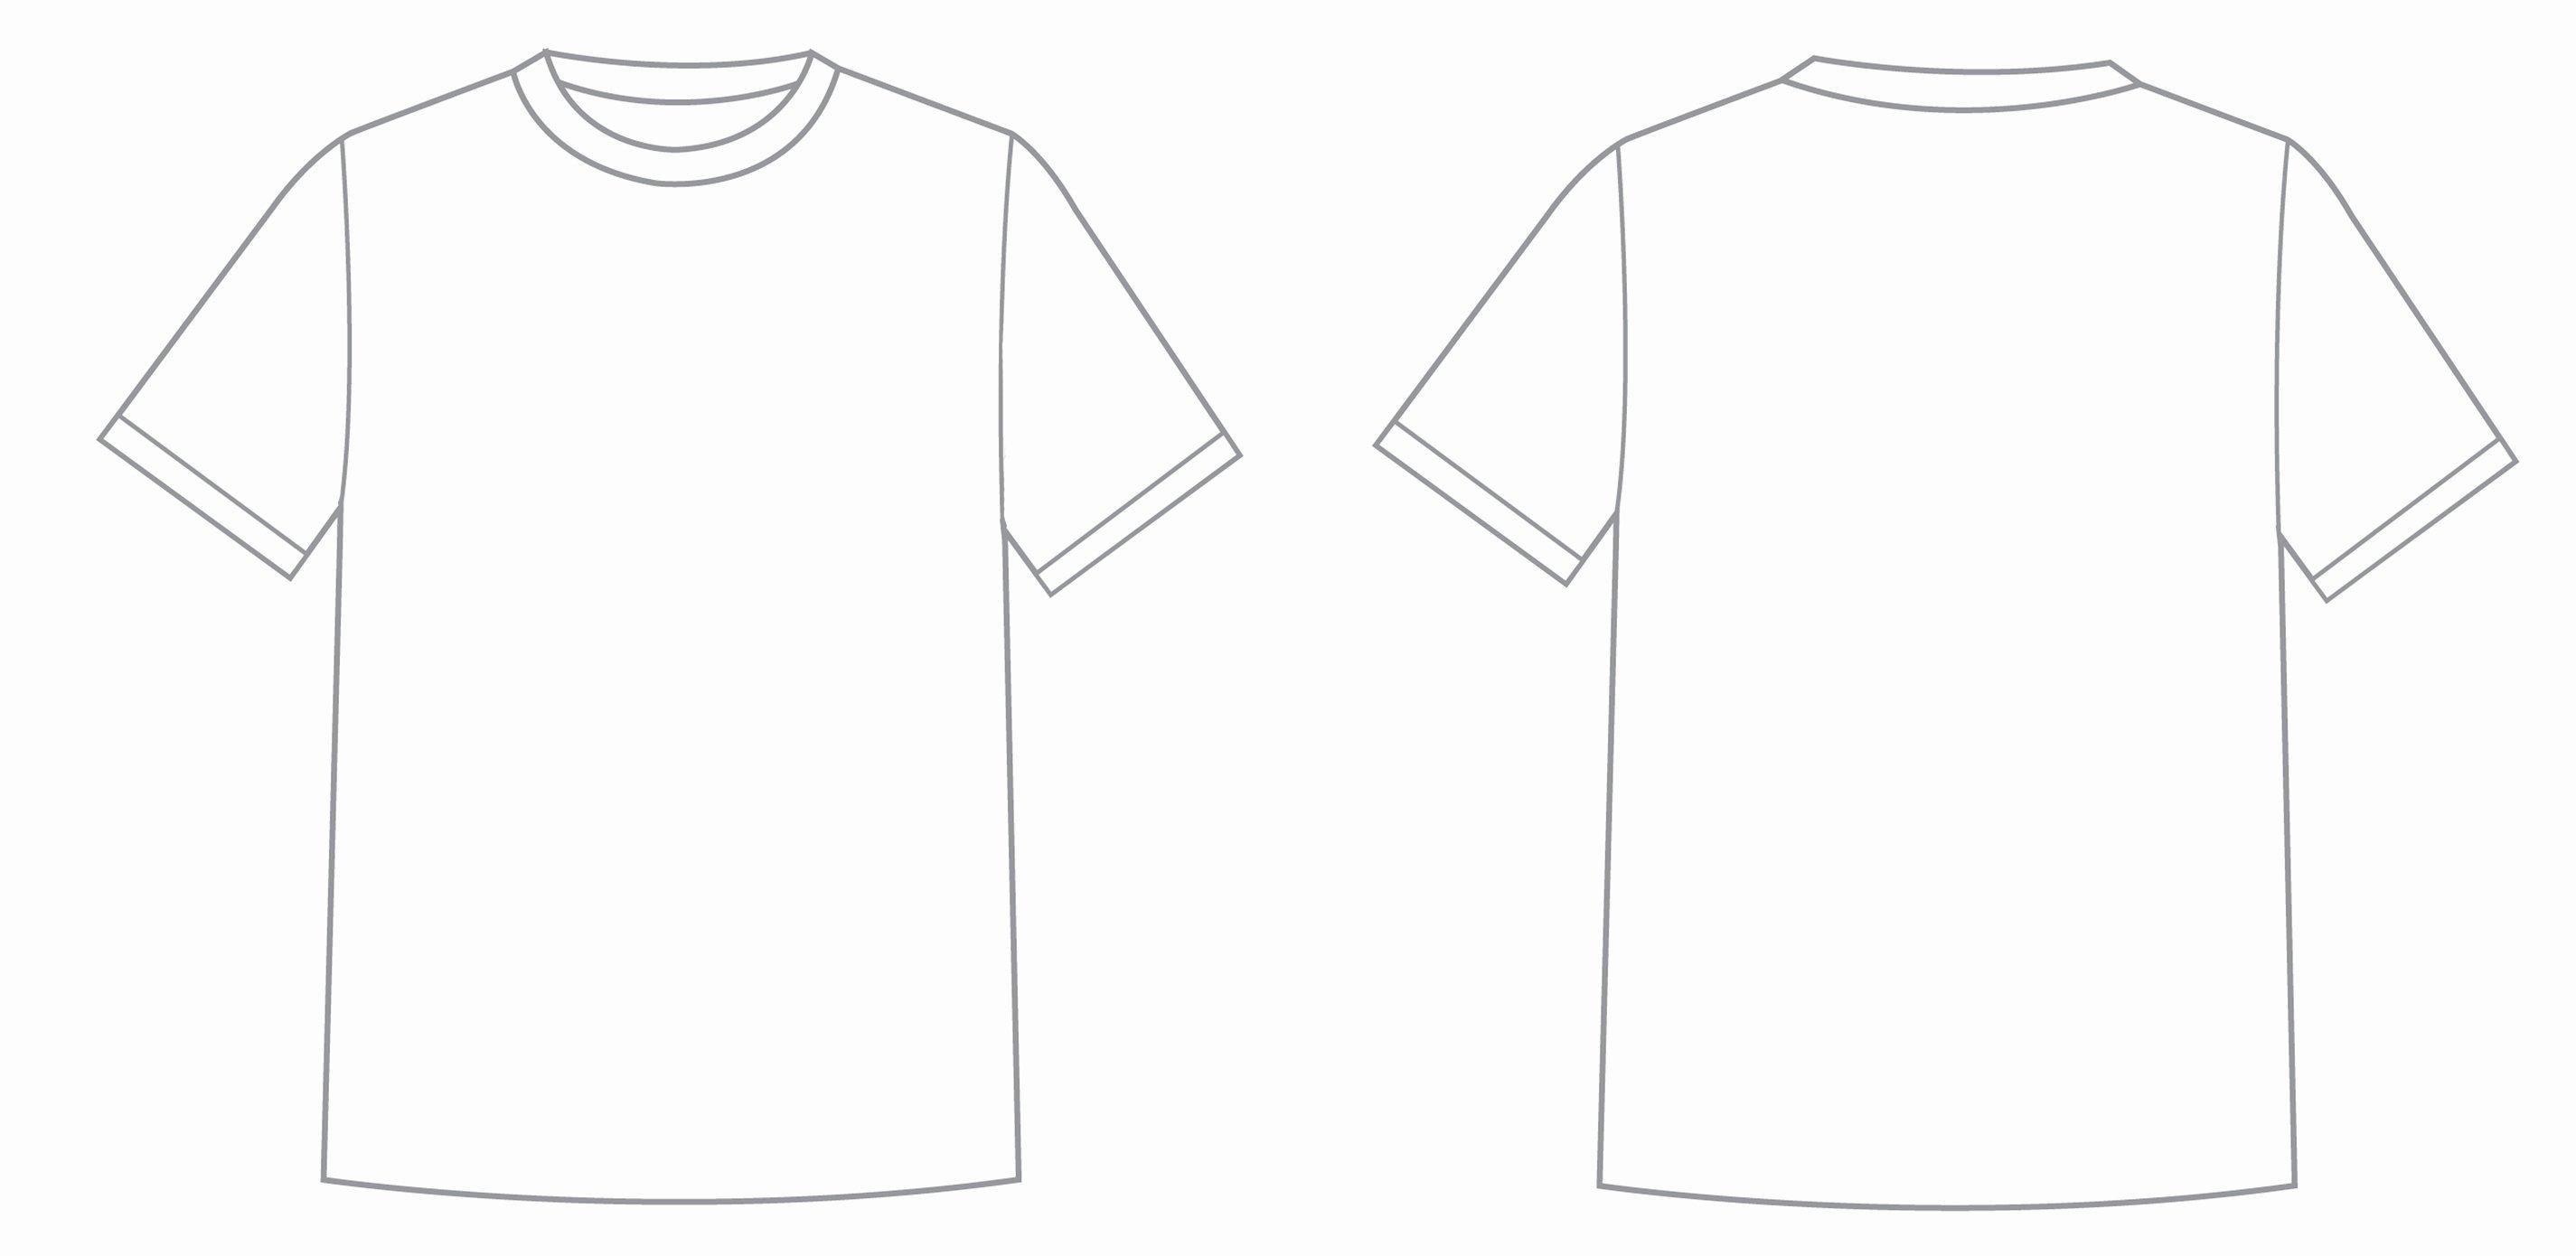 T Shirt Template Illustrator Elegant T Shirt Template Illustrator